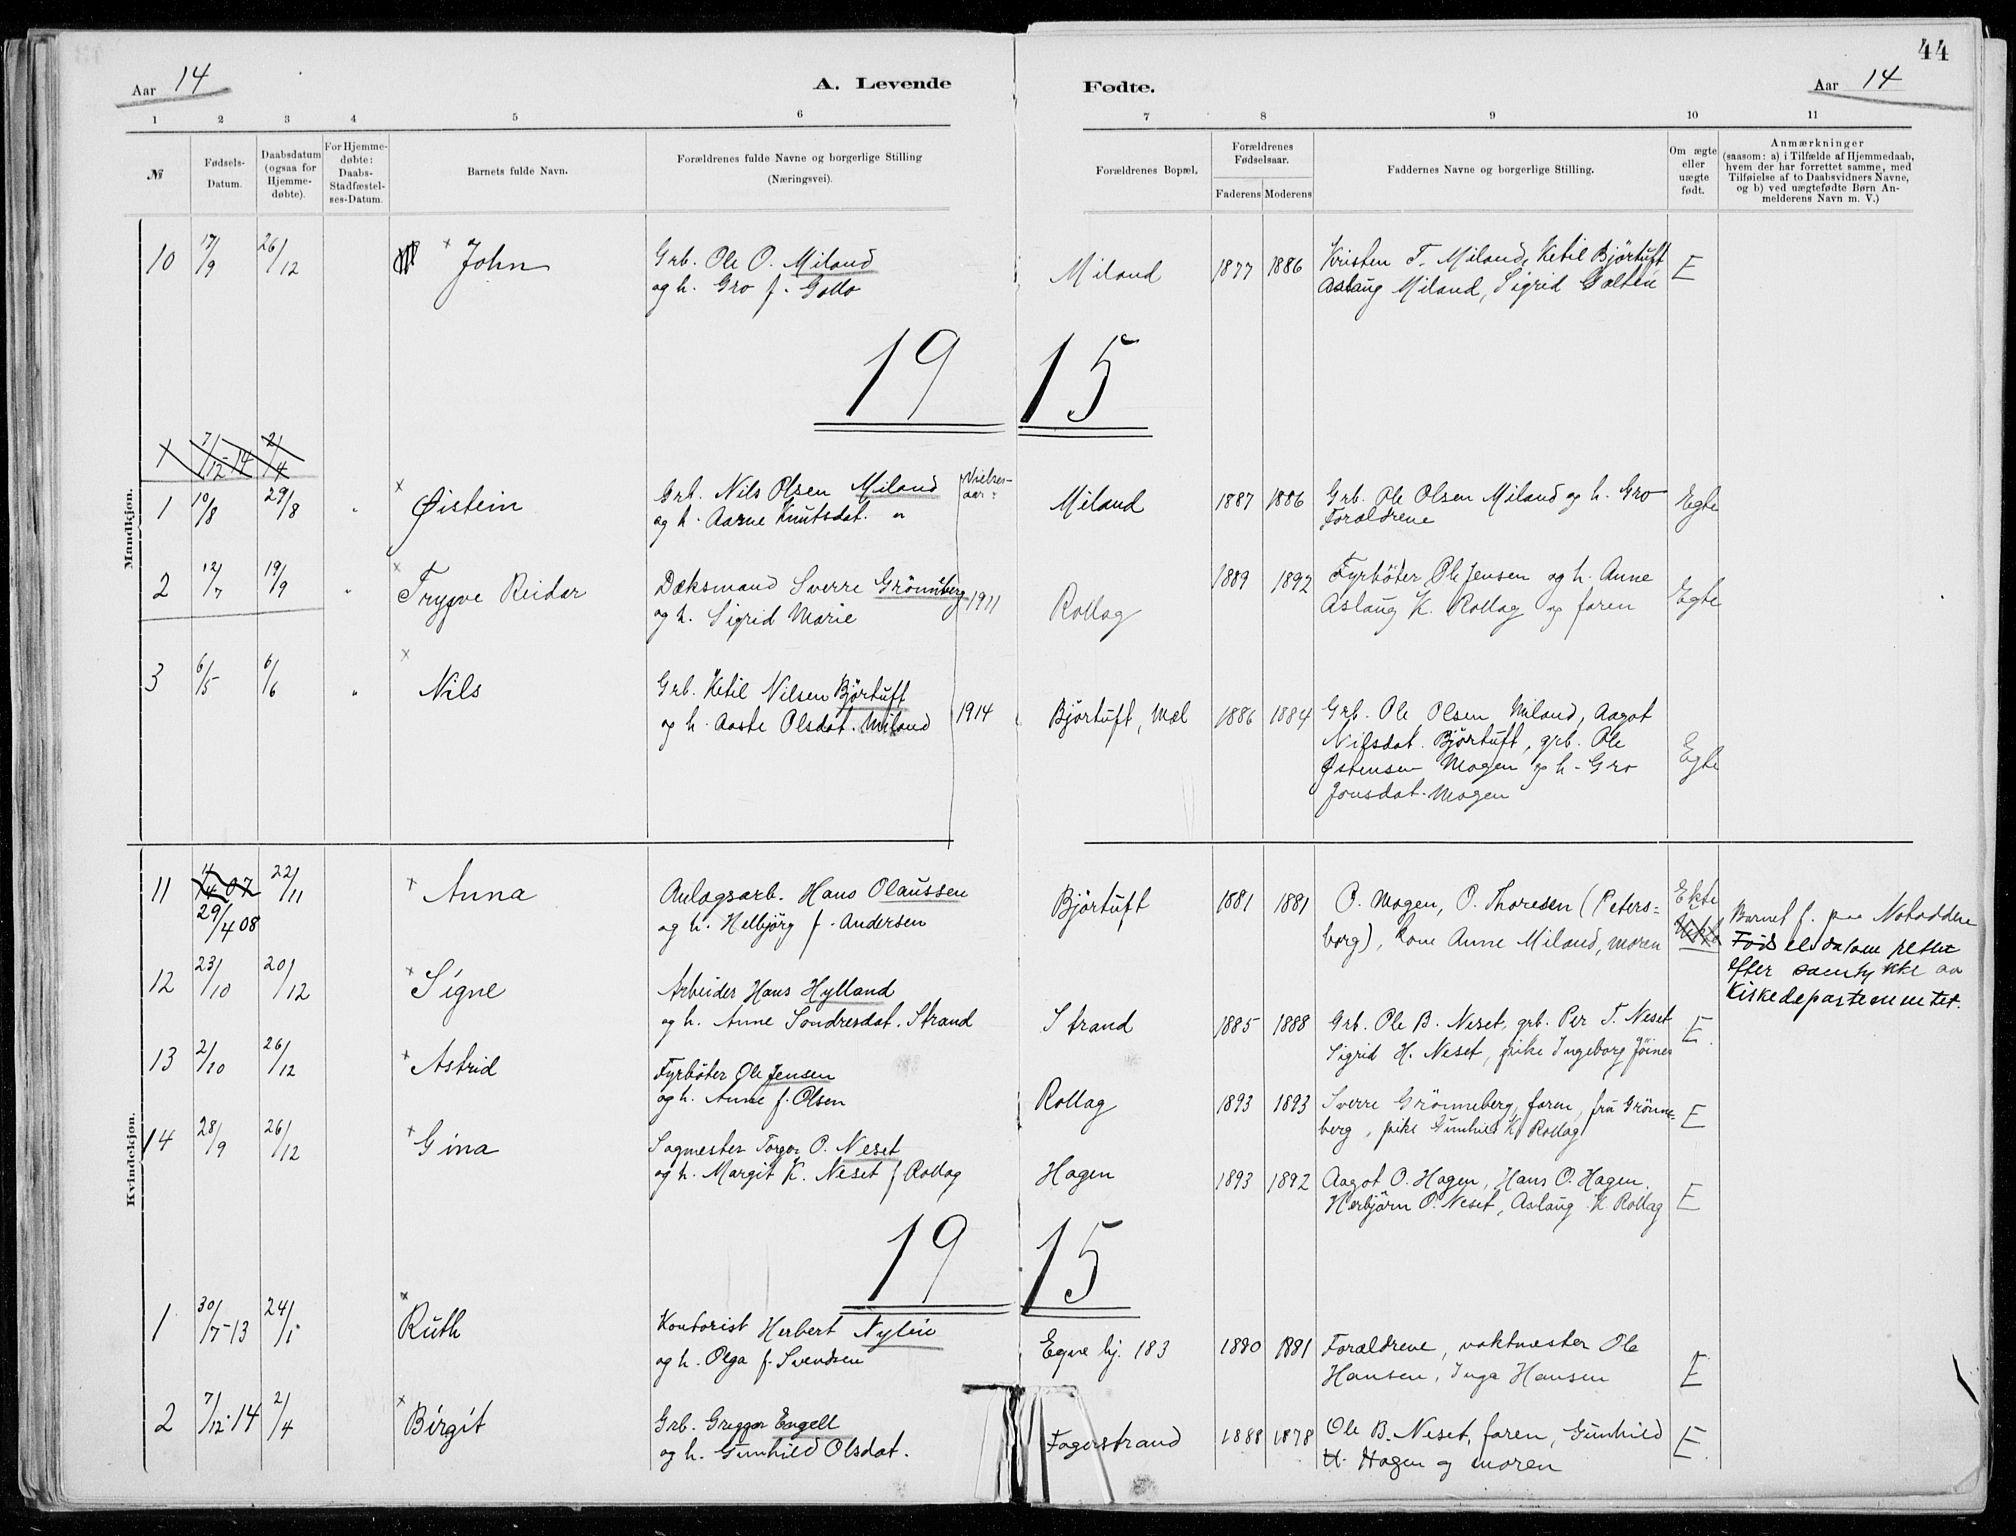 SAKO, Tinn kirkebøker, F/Fb/L0002: Ministerialbok nr. II 2, 1878-1917, s. 44